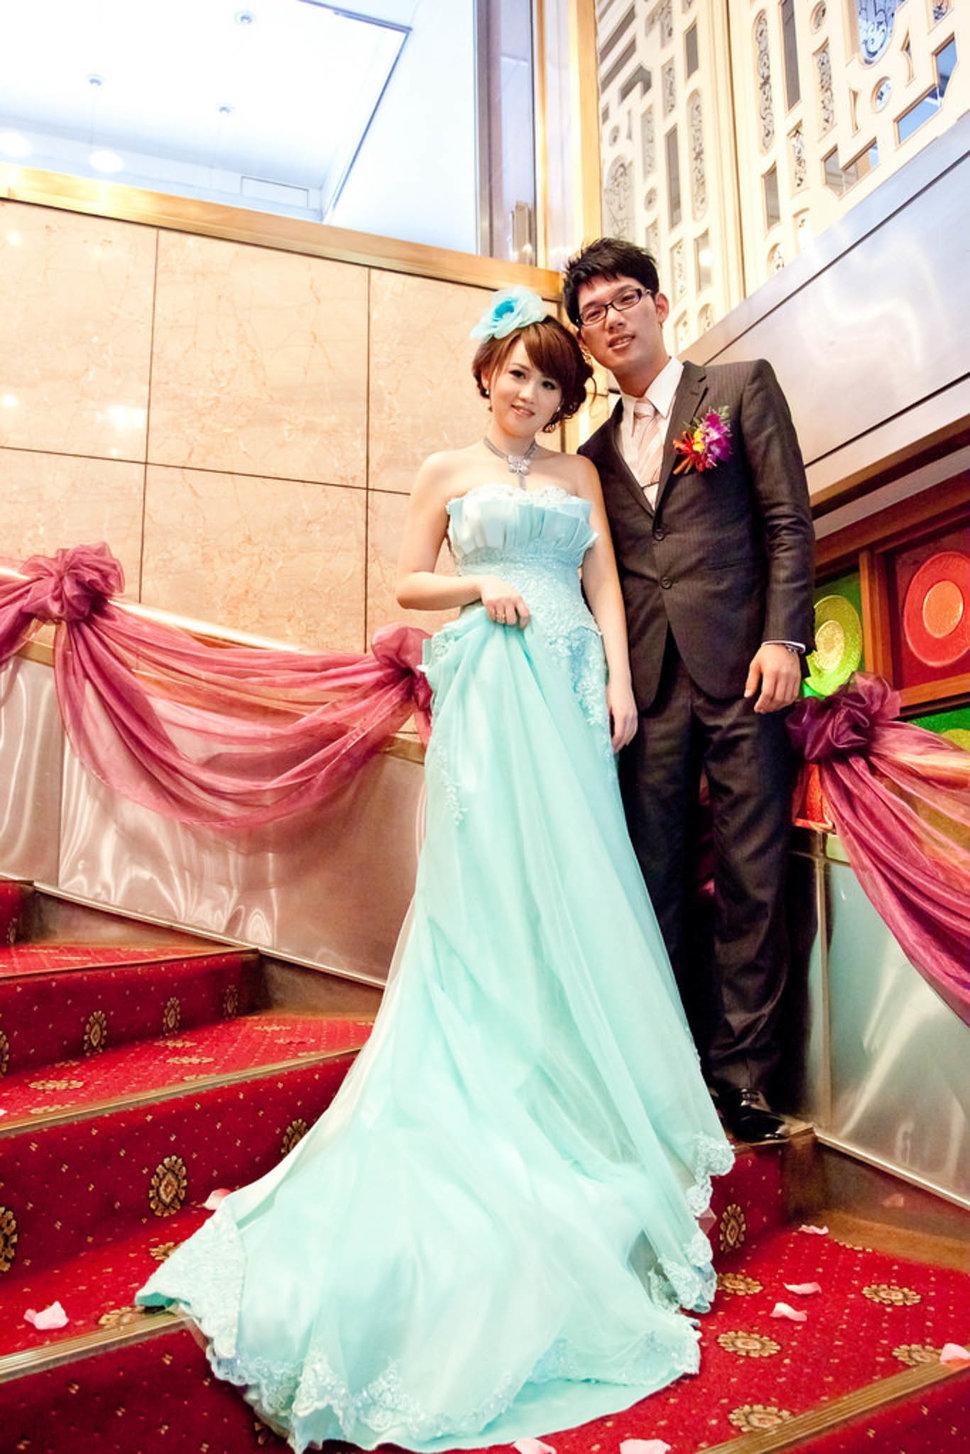 18PHOTO-佳成❤️ 玨萍(編號:220203) - 18PHOTO 婚紗影像攝影工作室 - 結婚吧一站式婚禮服務平台